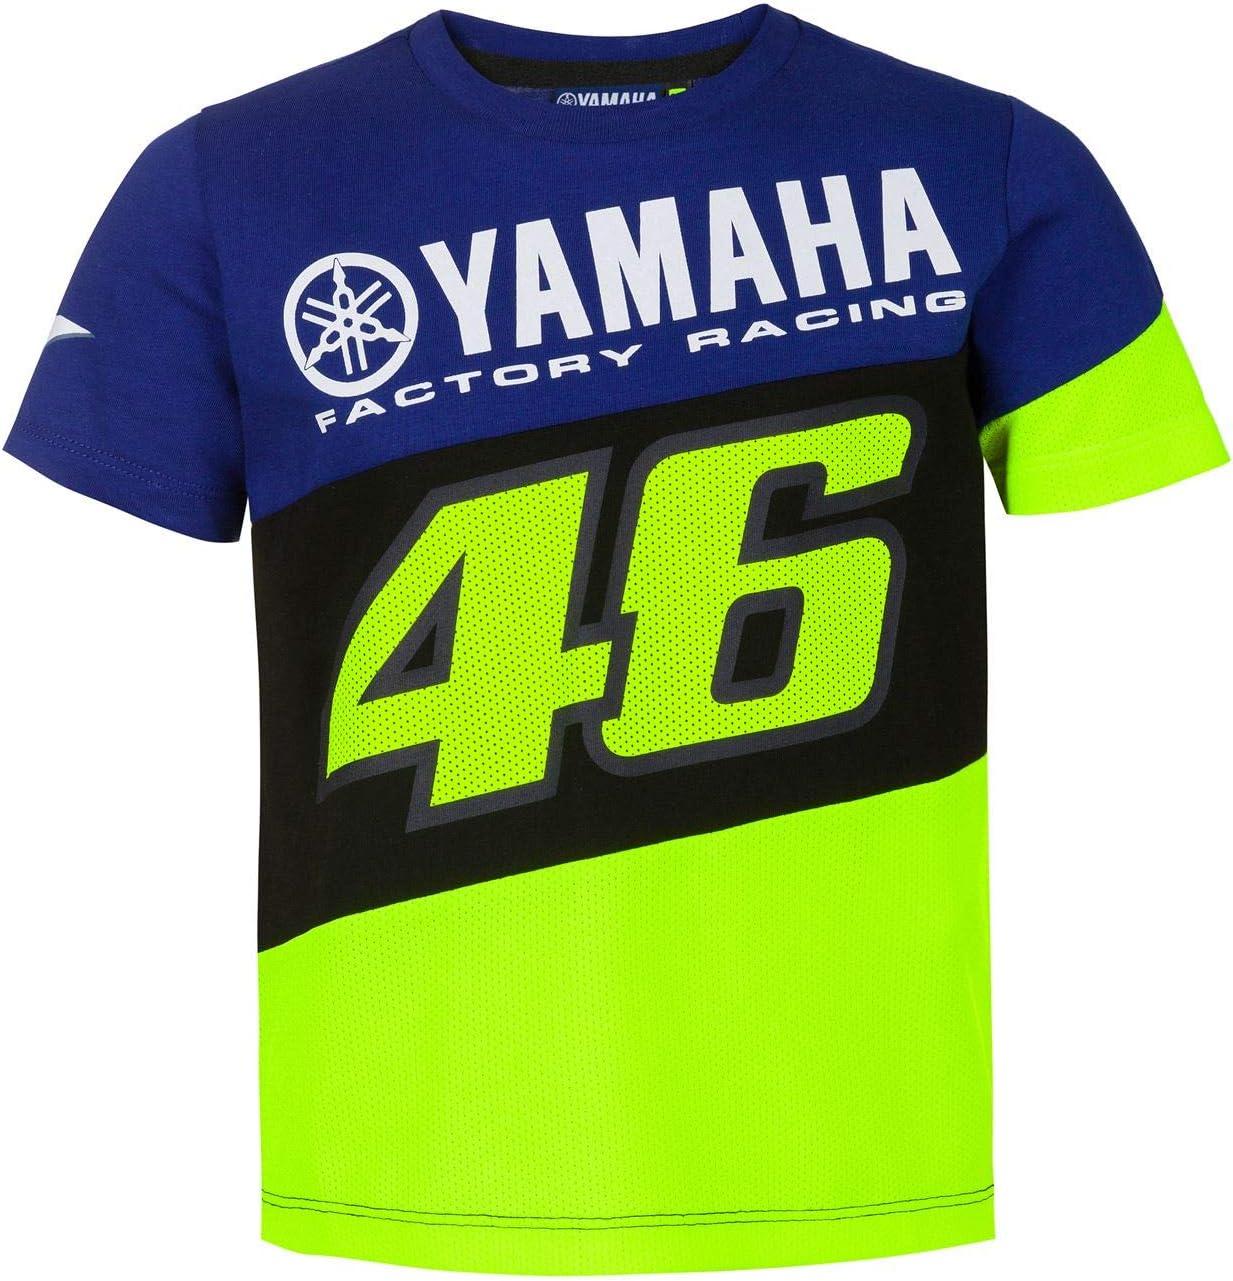 Valentino Rossi Junior T Shirt Vr46 Motogp M1 Yamaha Offizielle 2020 Bekleidung